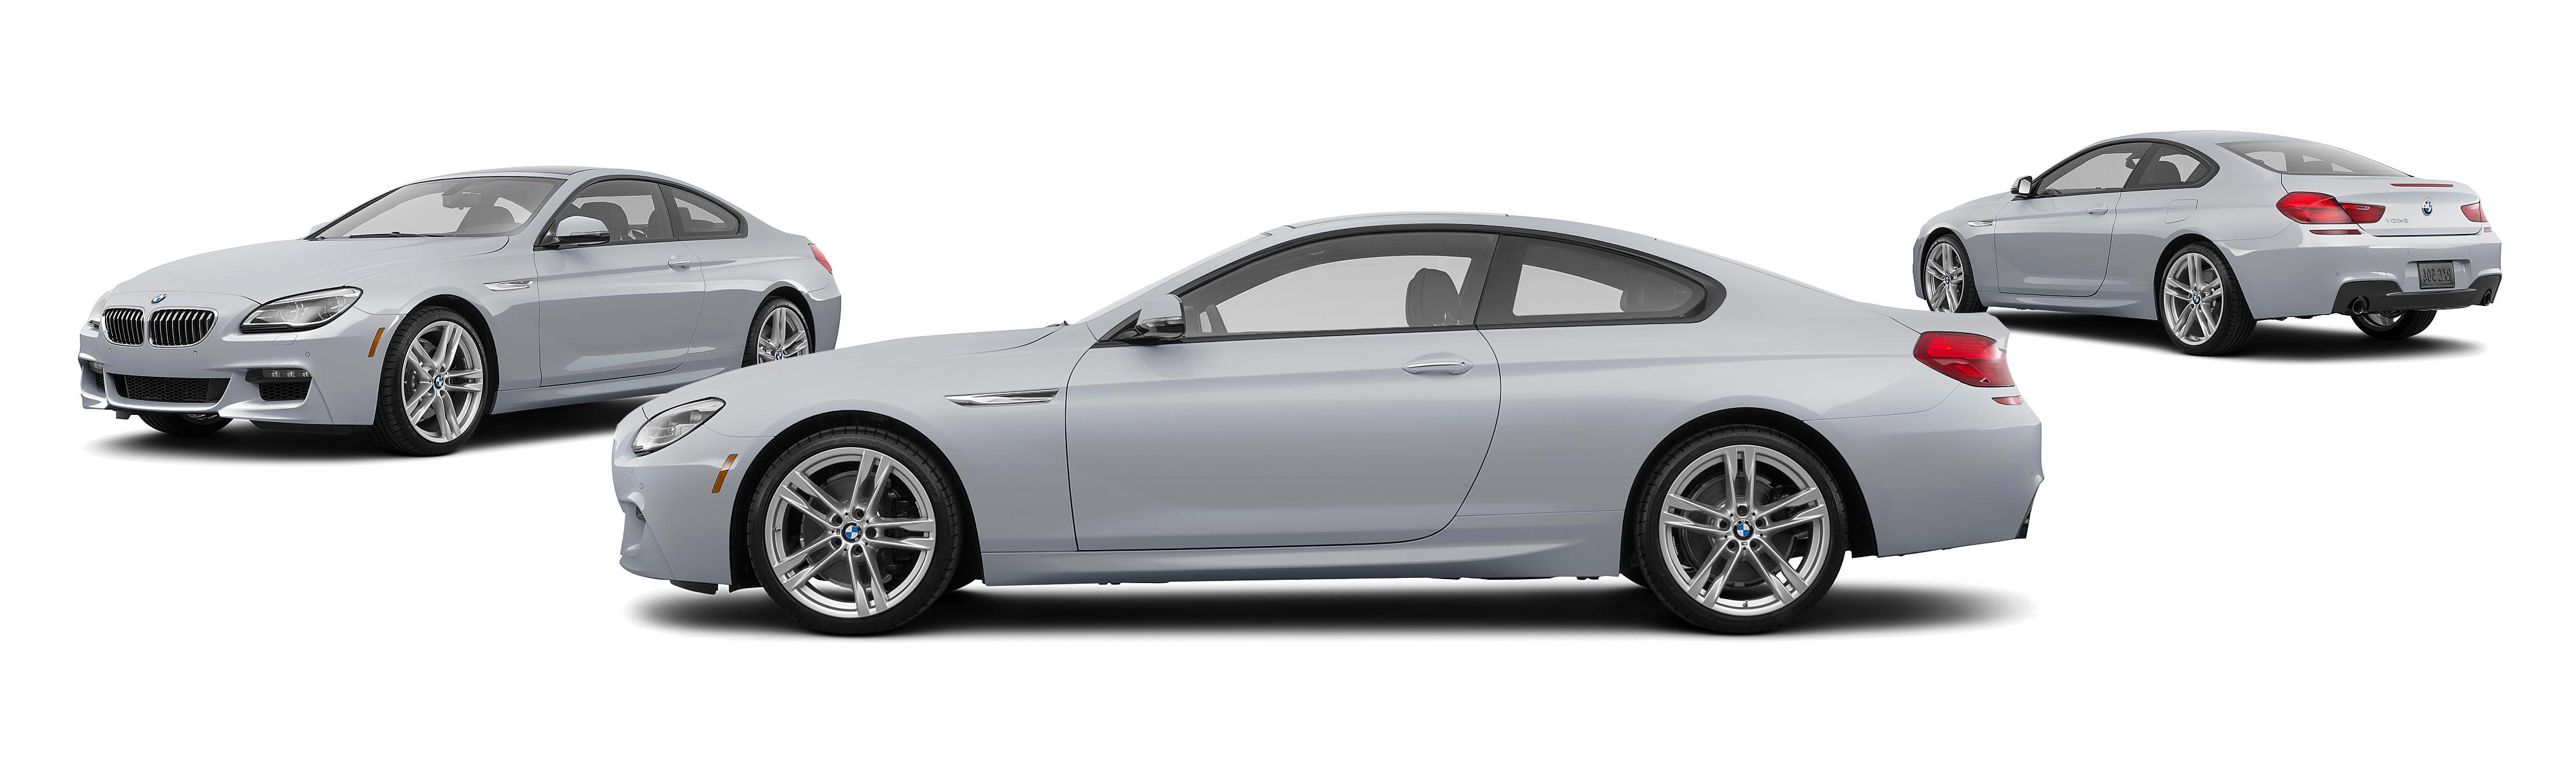 2017 BMW 6 Series AWD 650i XDrive 2dr Coupe